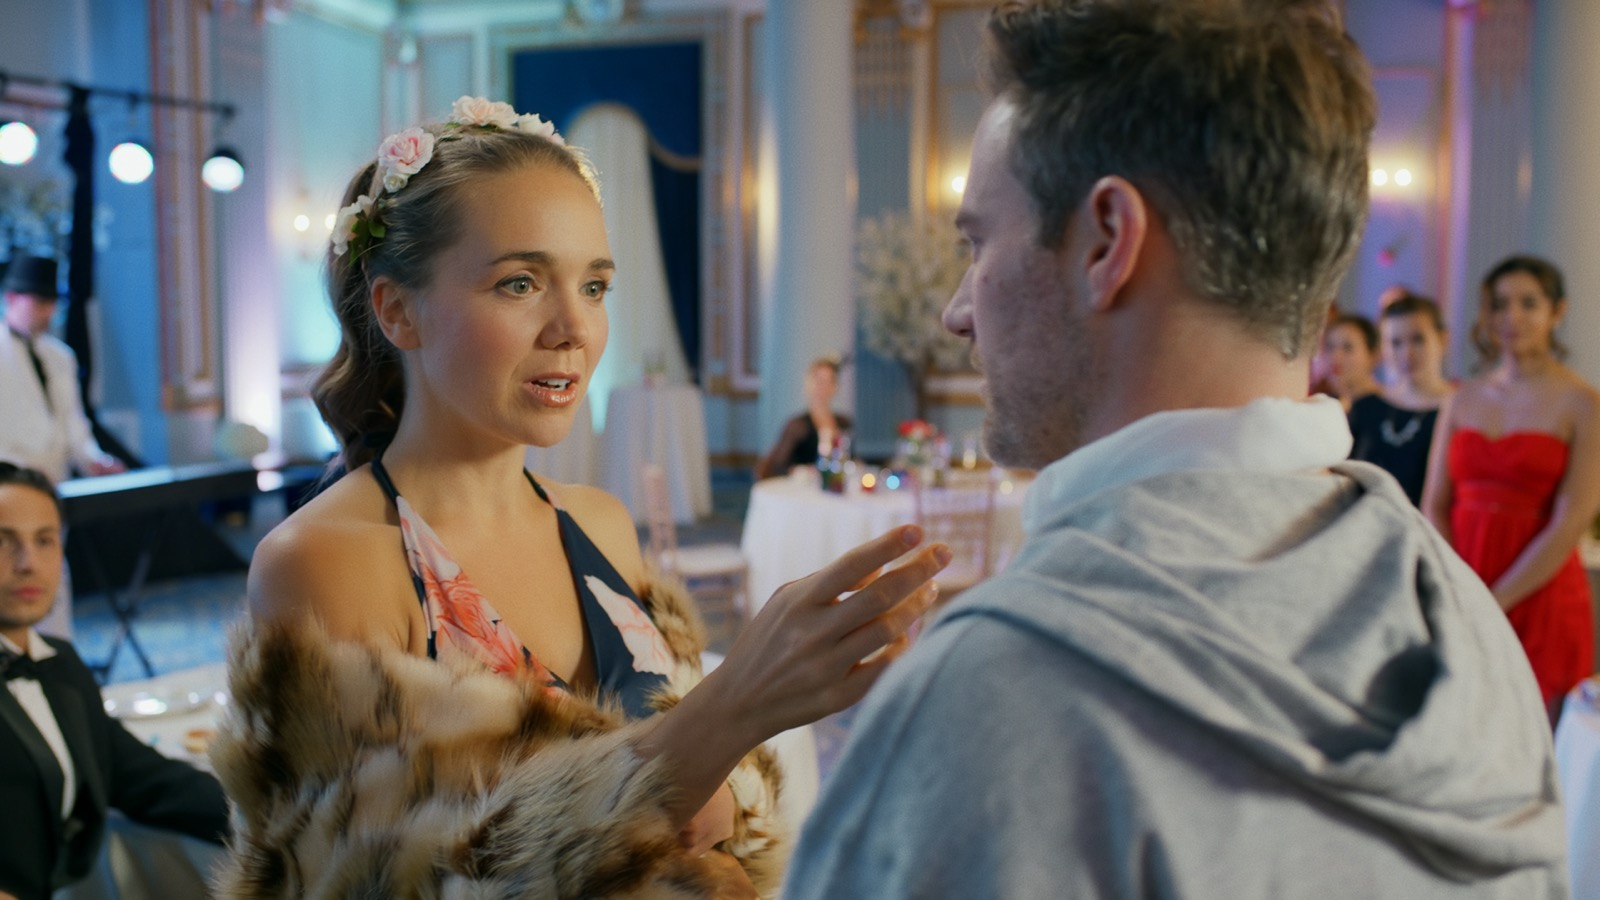 Lucie Vondráčková dans le film Hotel Limbo (2020) - 4 ...